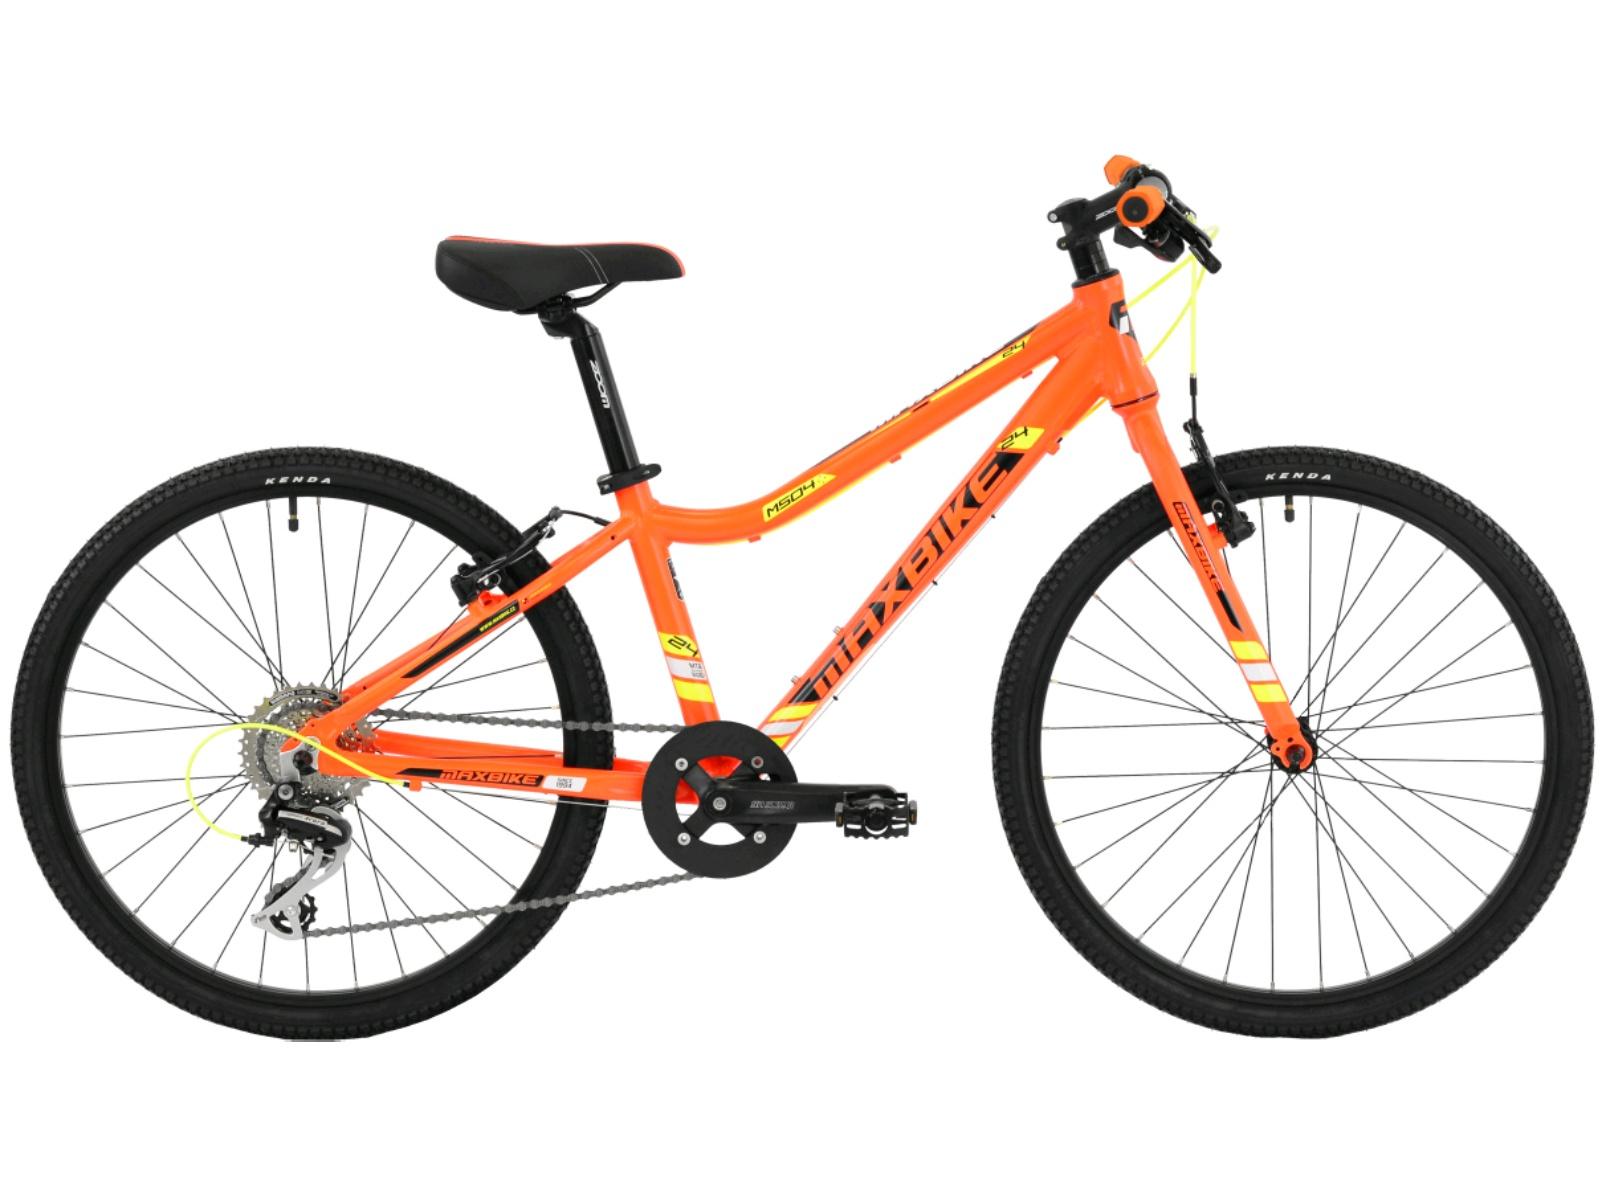 "Detský bicykel MAXBIKE Pirin 24"" - matne čierny"